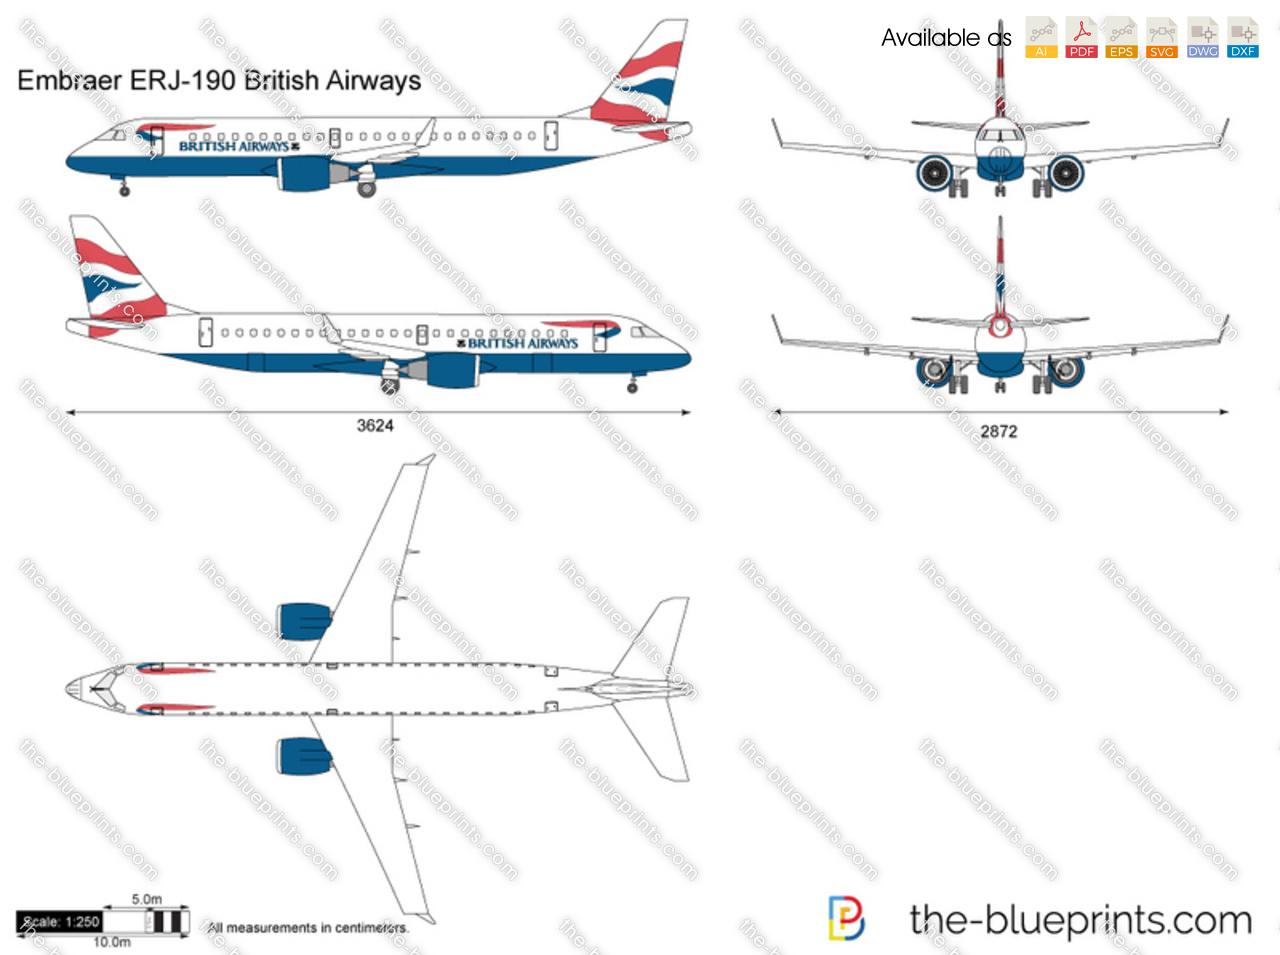 Embraer ERJ-190 British Airways